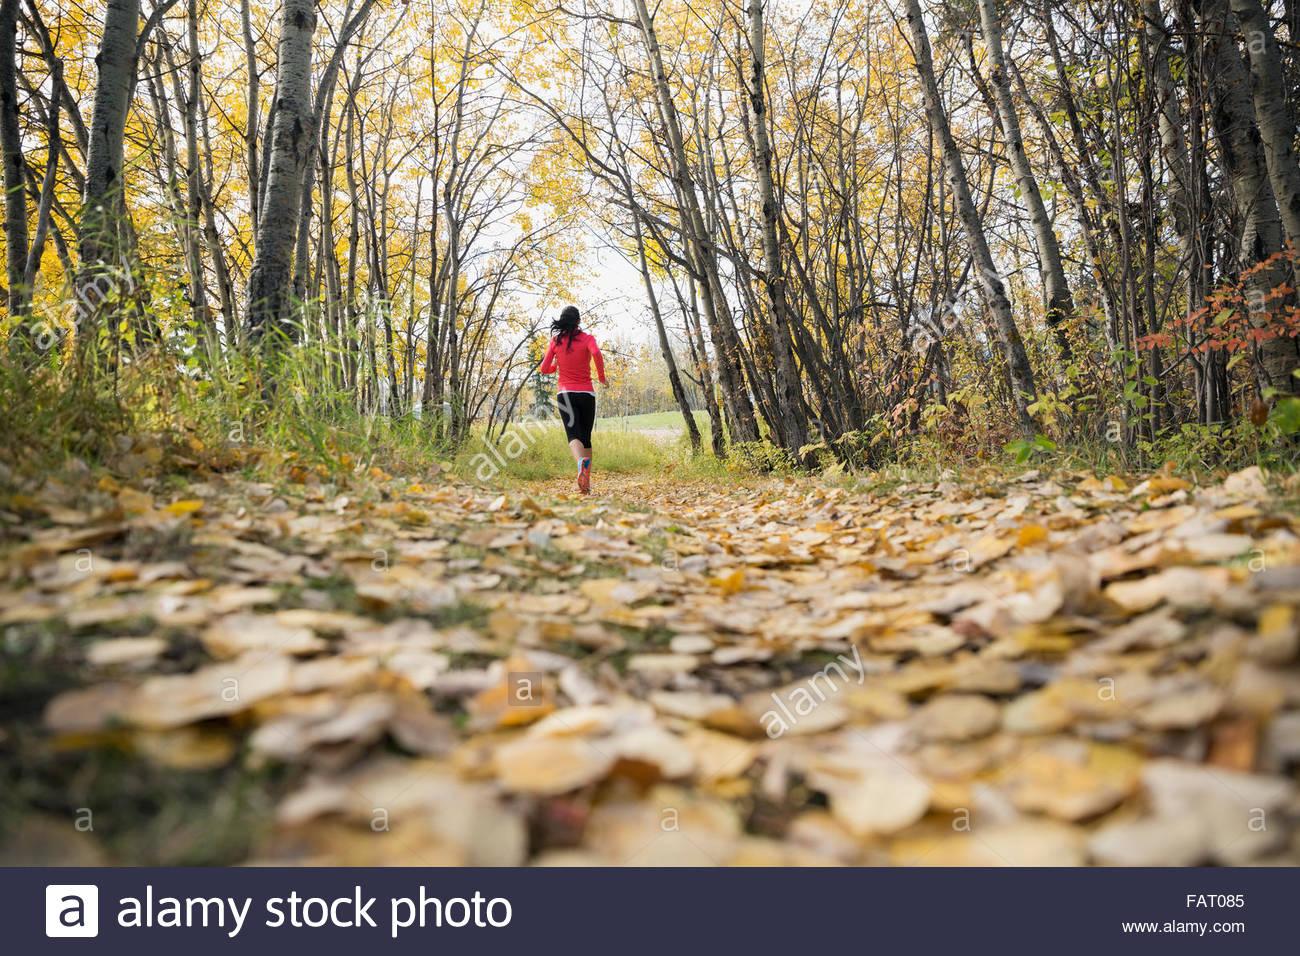 Frau auf Pfad im Herbst Park Joggen Stockbild